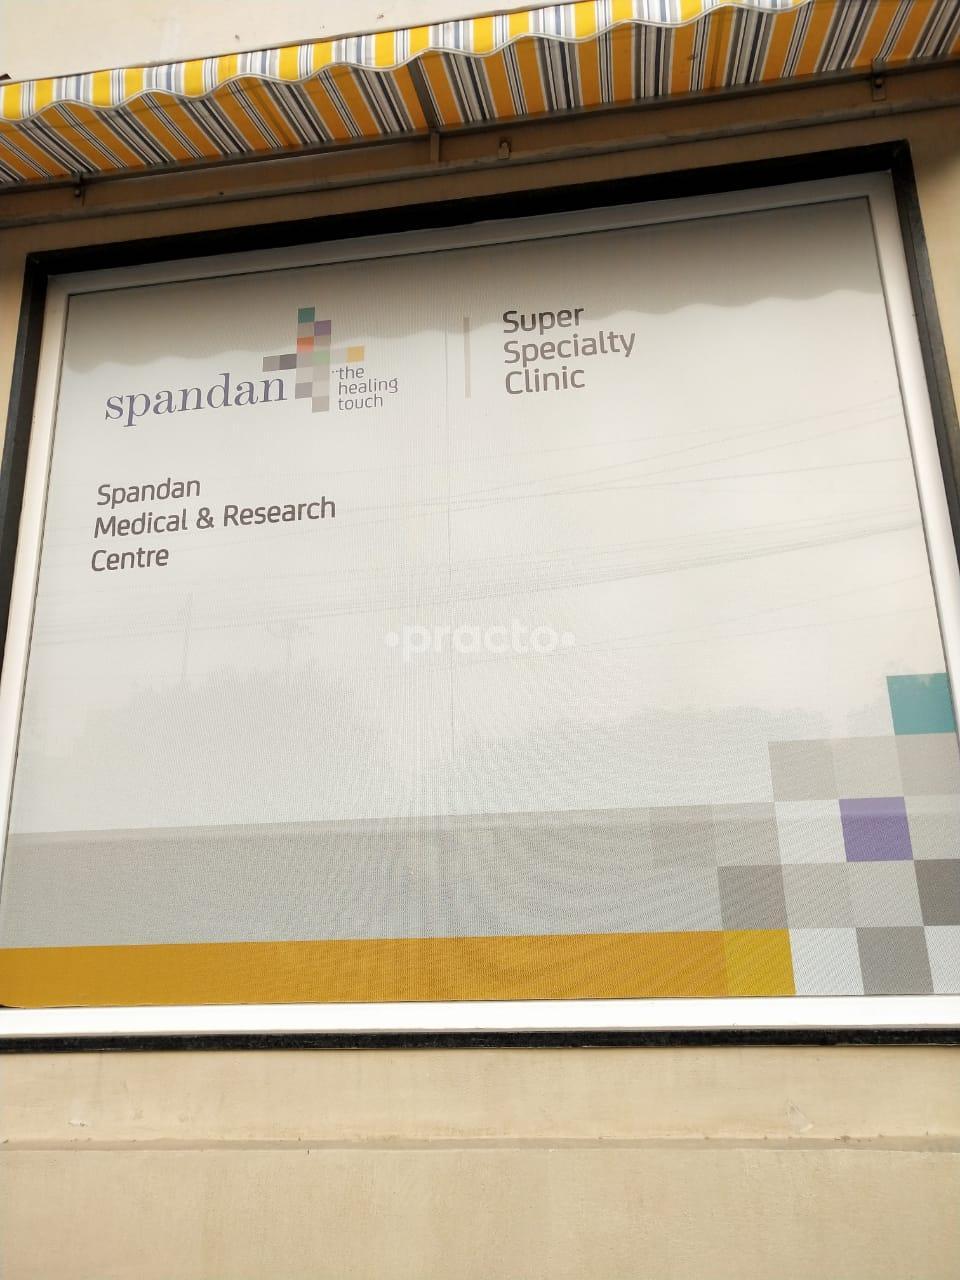 Spandan Medical & Research Centre